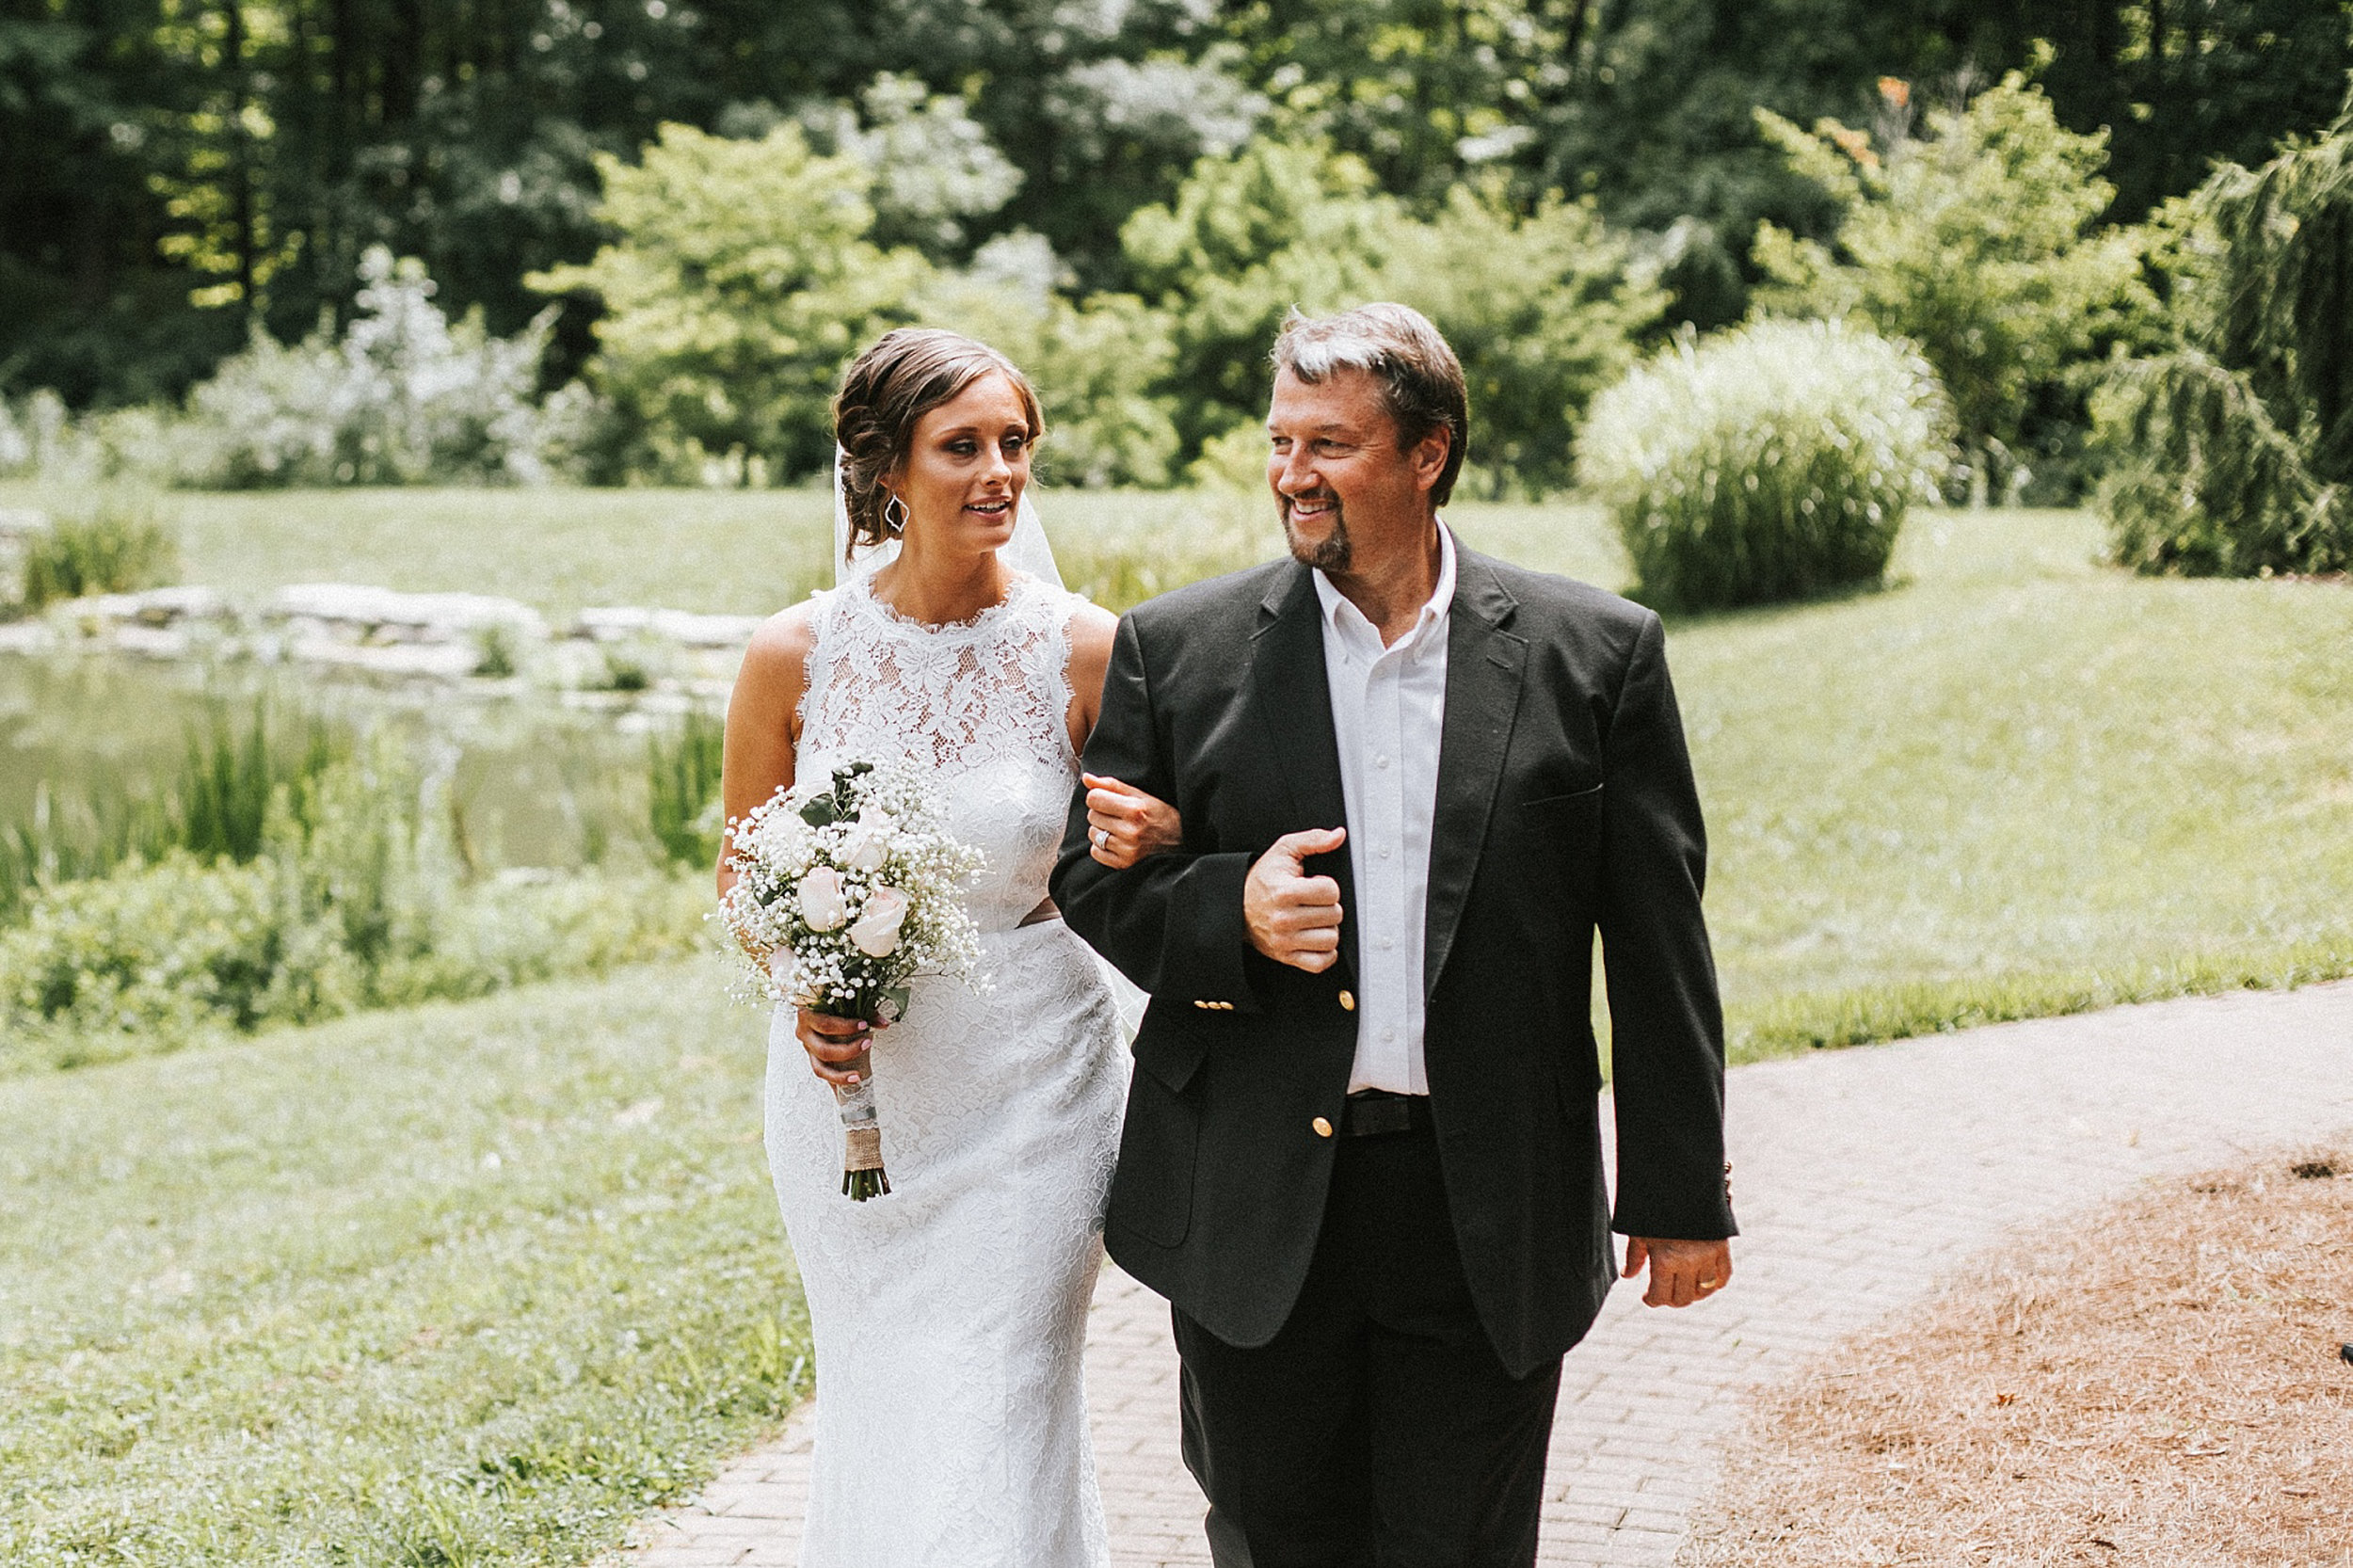 Brooke Townsend Photography - Ohio Wedding Photographer (51 of 78).jpg